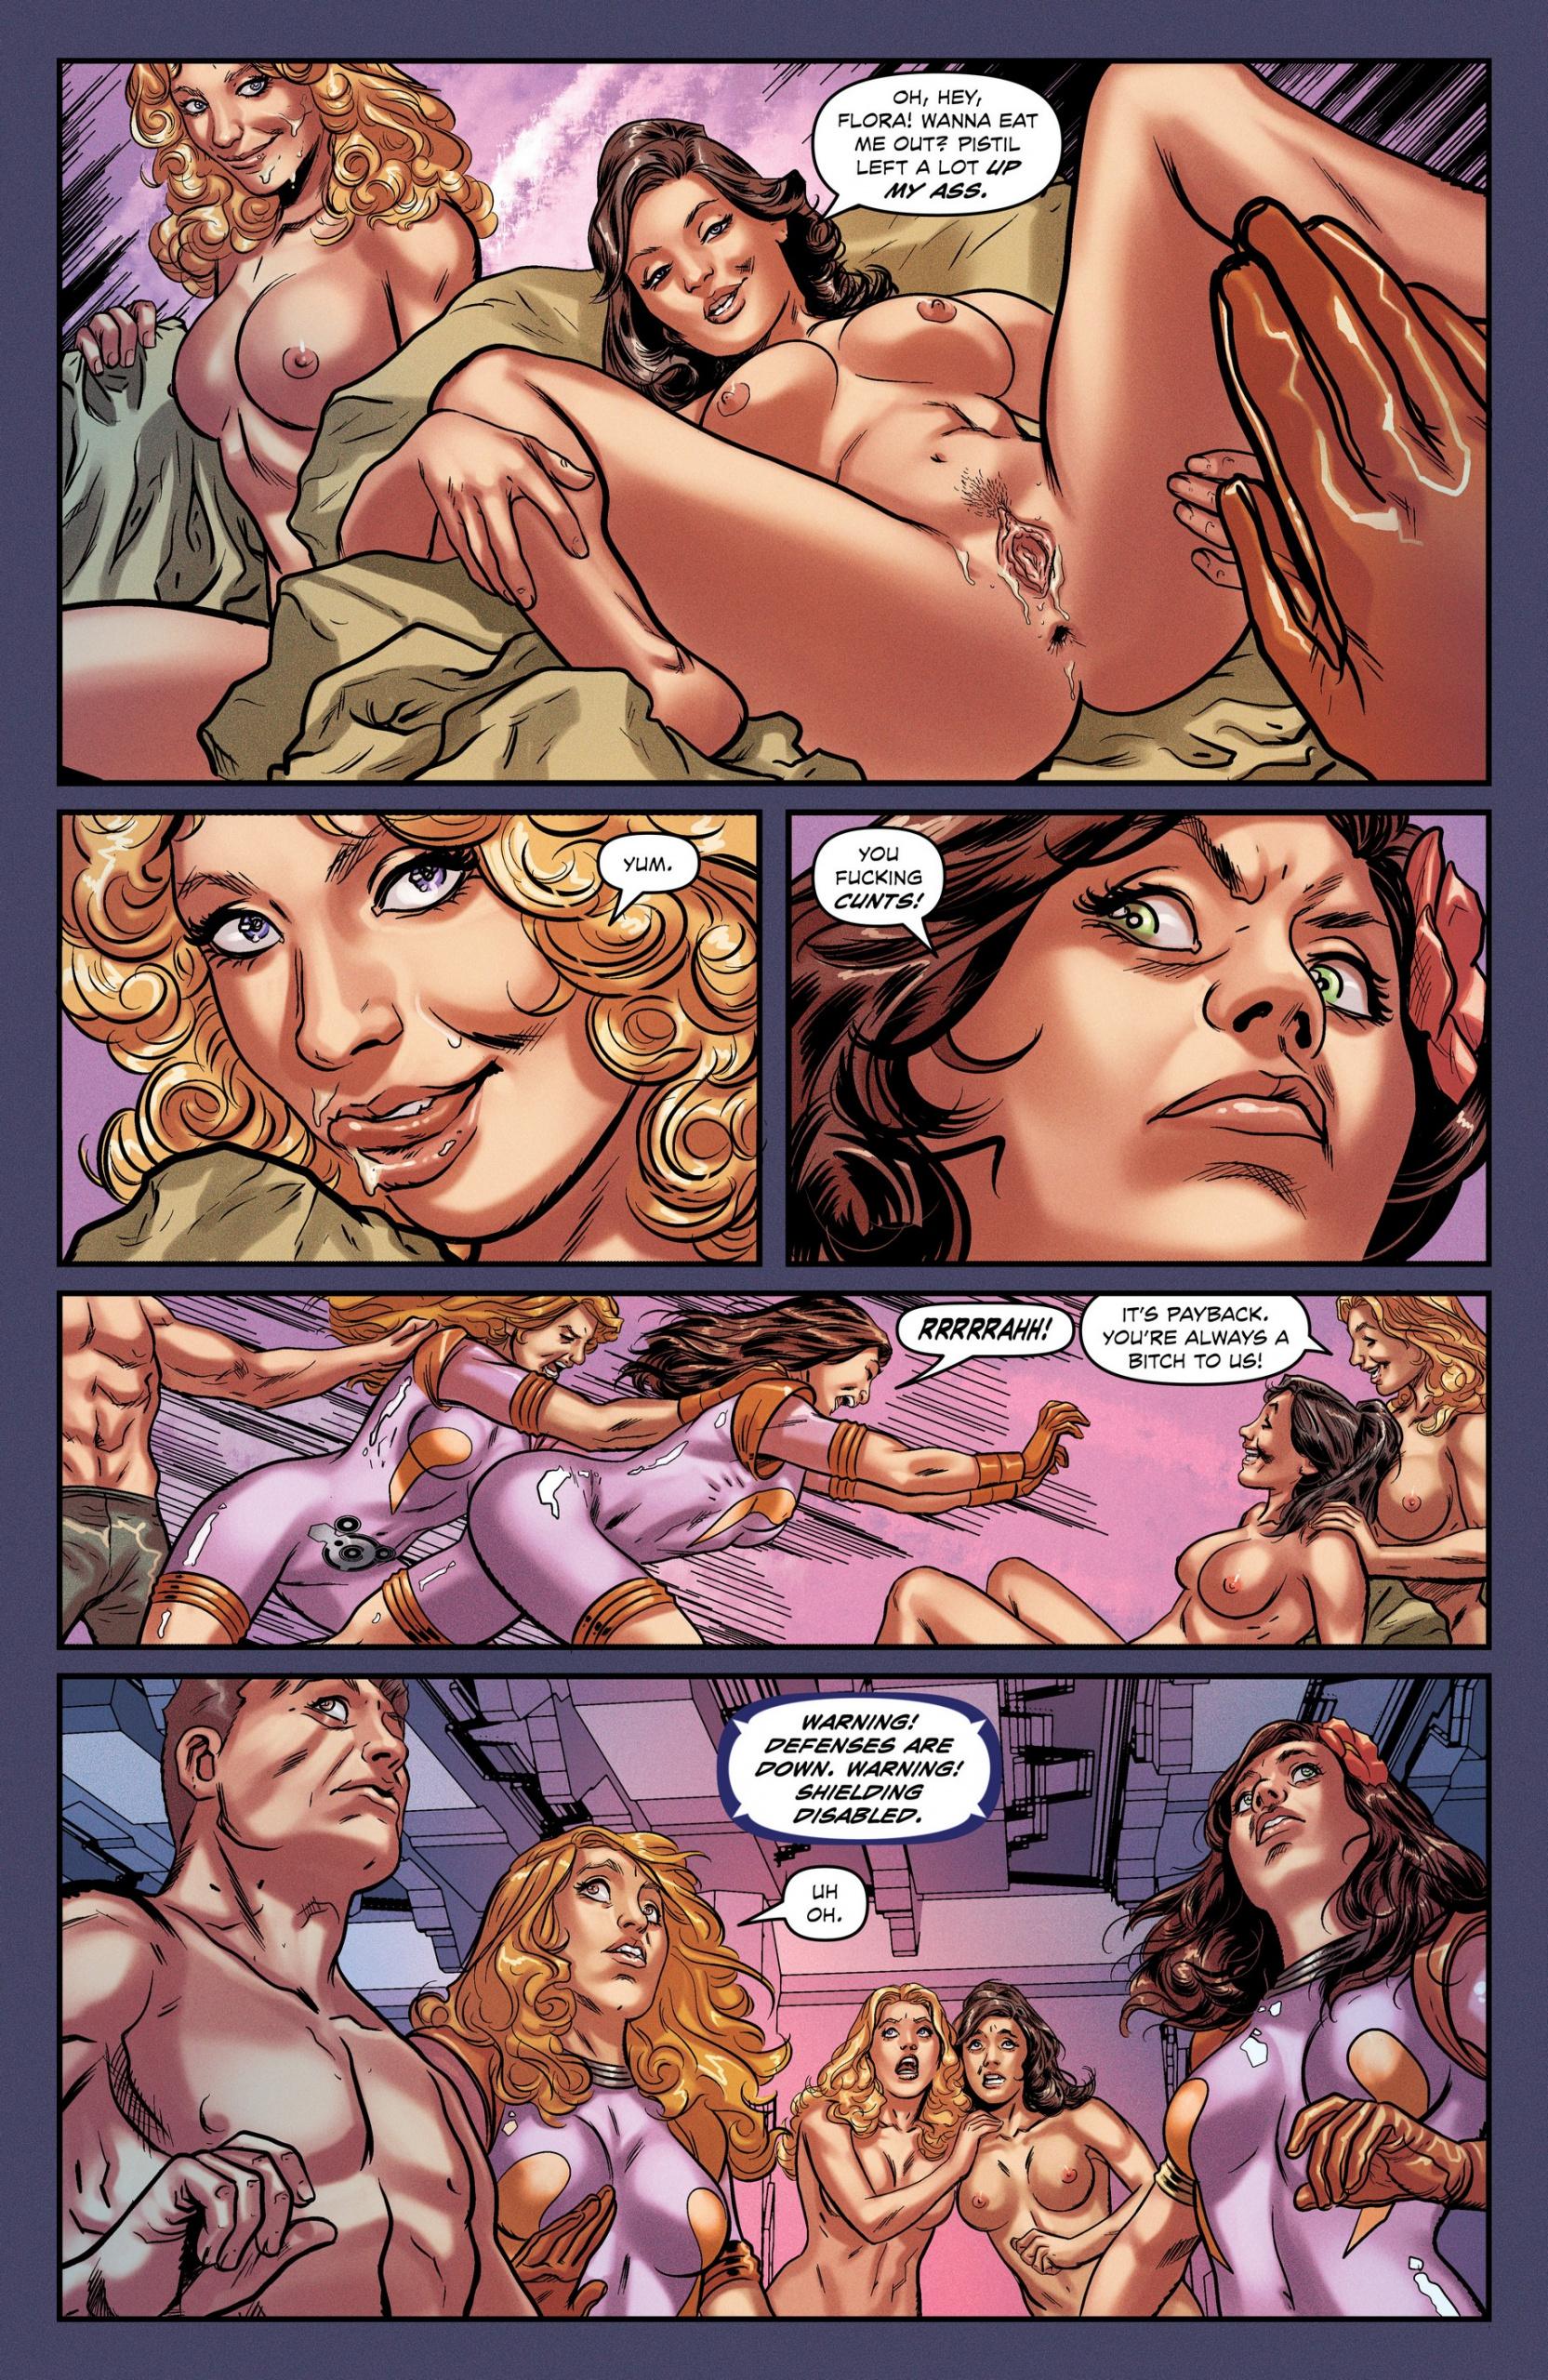 Jungle Fantasy - Secrets #1 porn comics Group Sex, Rape, Stockings